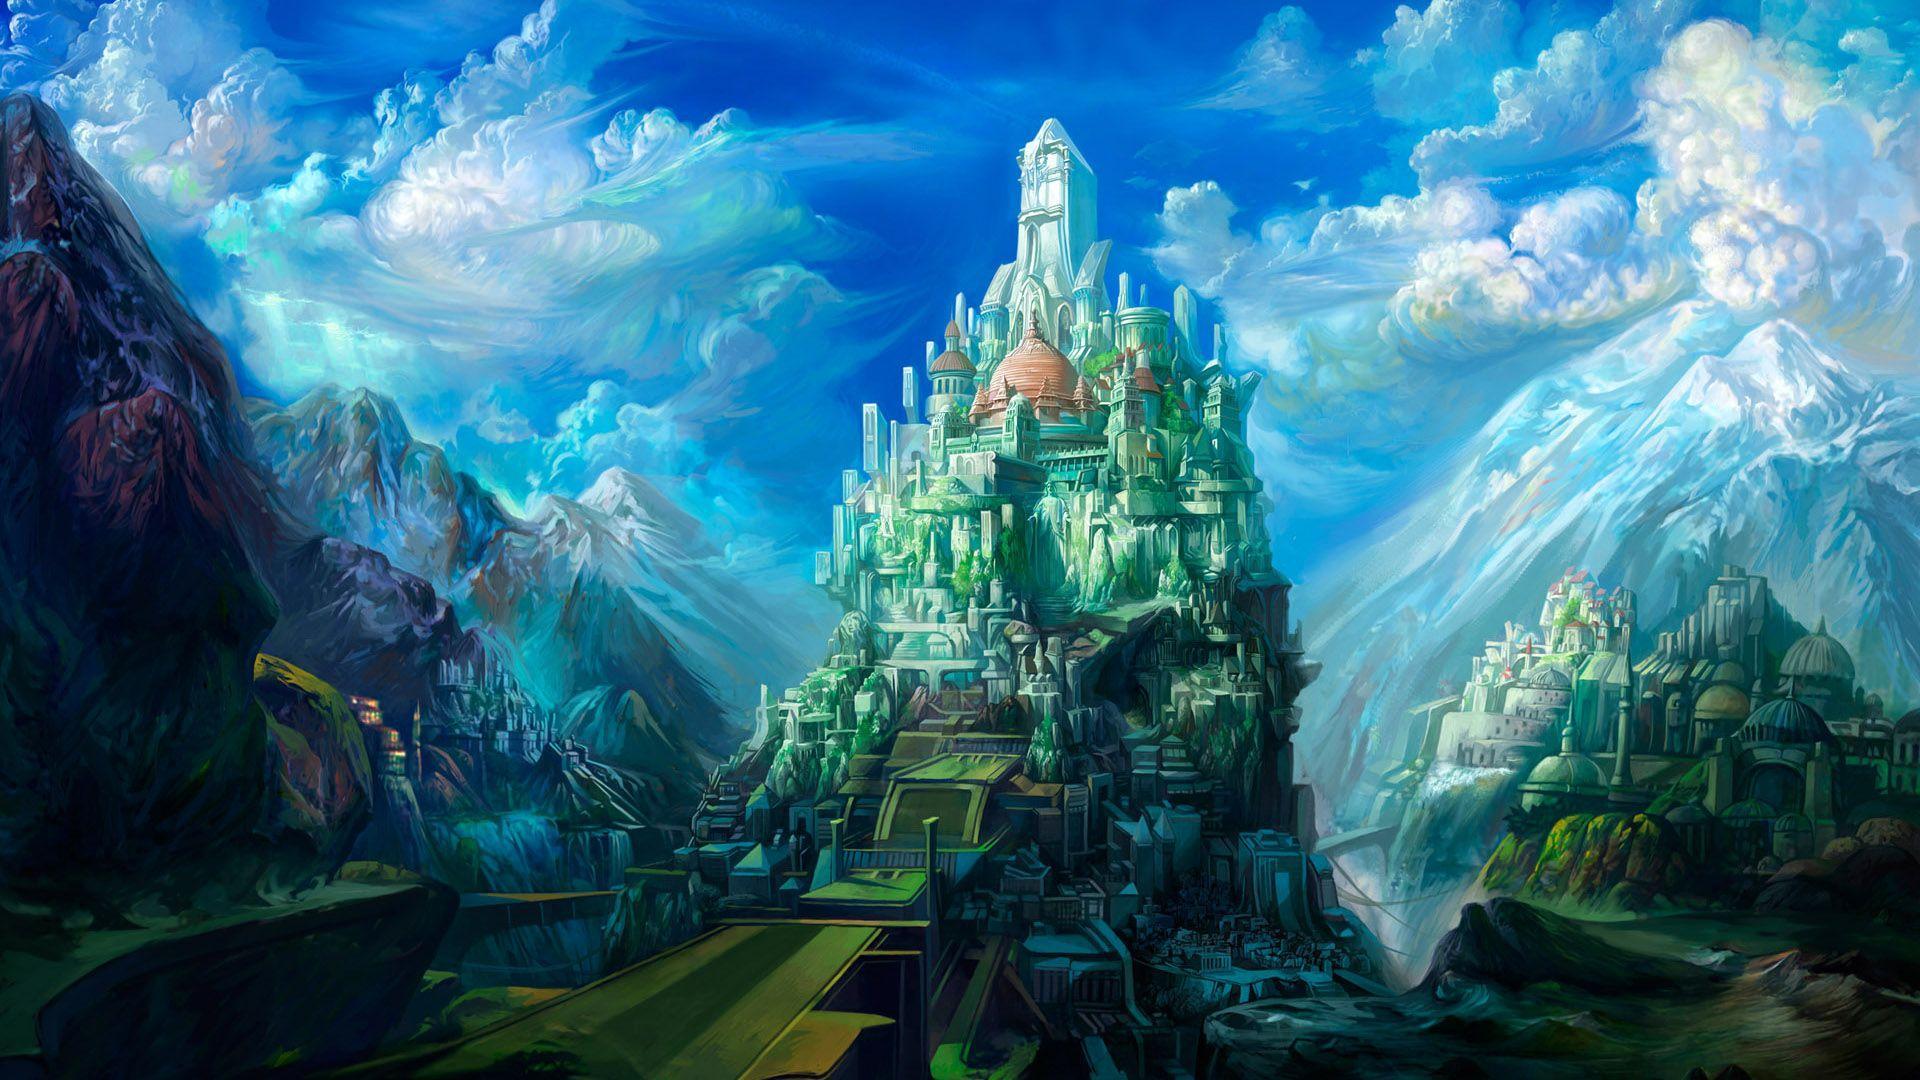 Amazing 3d Art Wallpapers Top Free Amazing 3d Art Backgrounds Wallpaperaccess